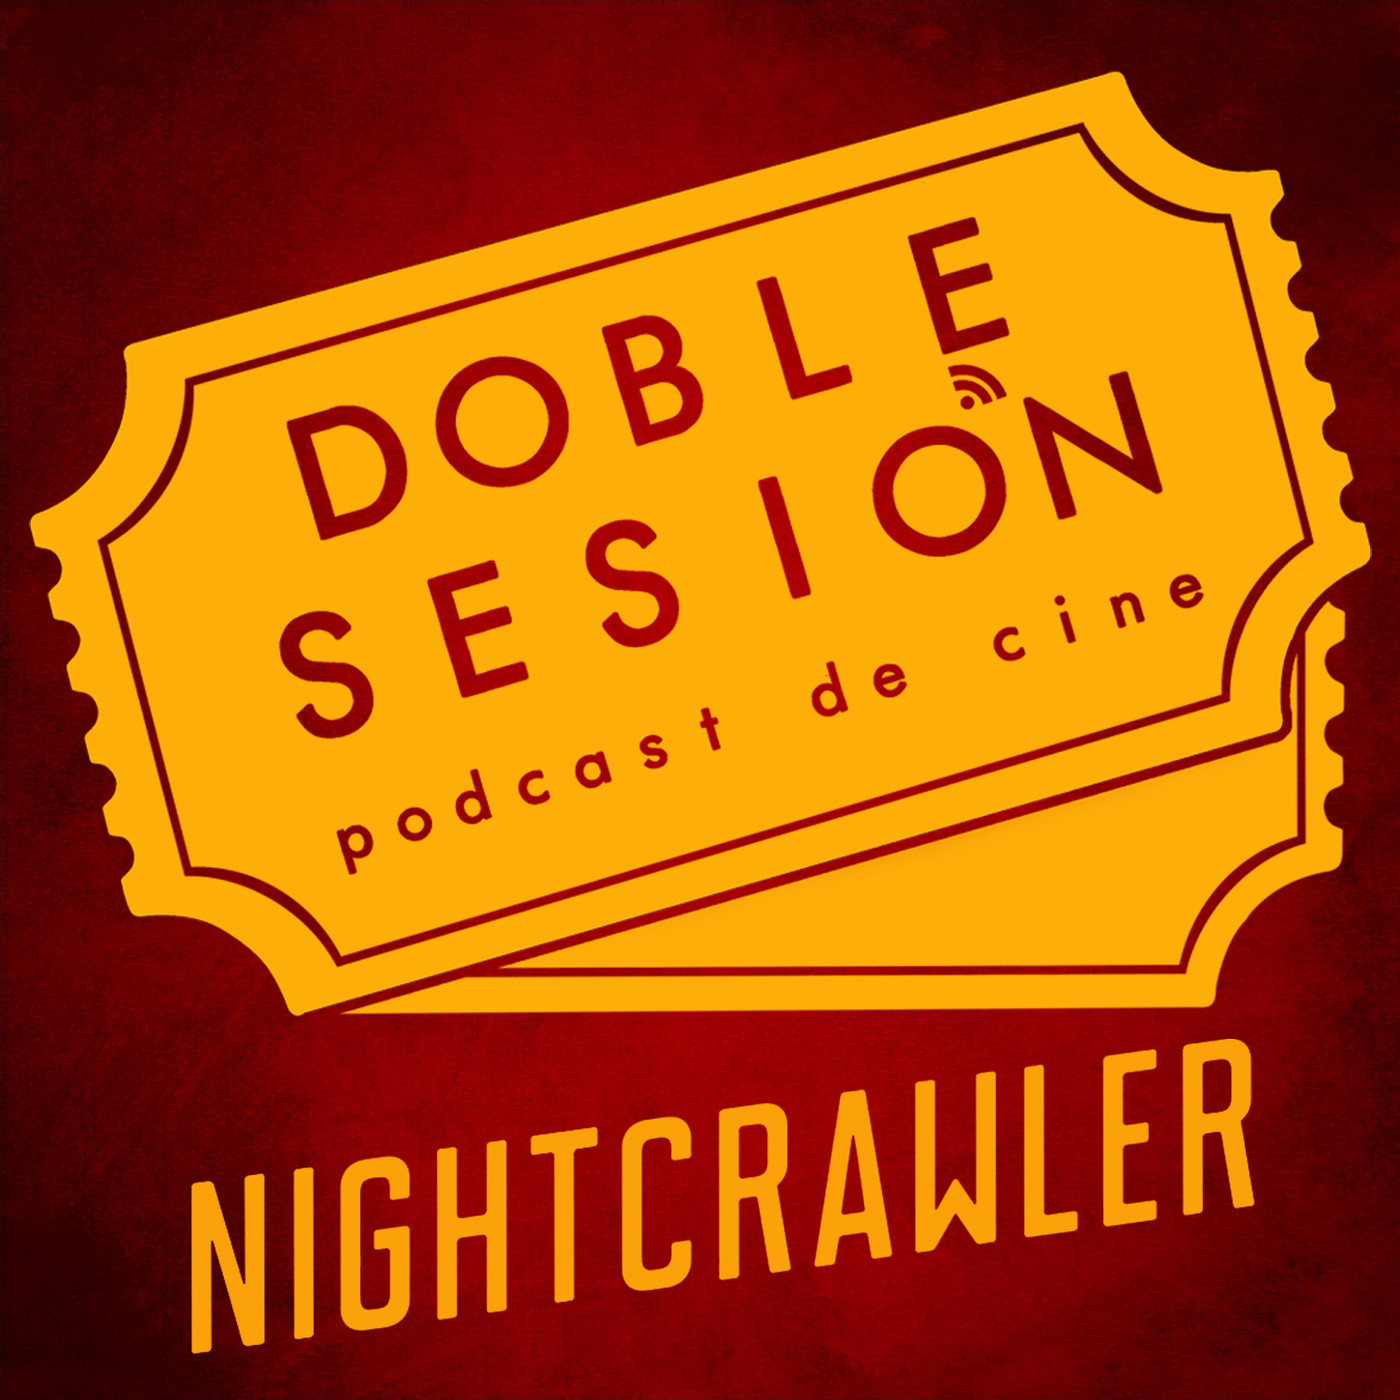 Nightcrawler (Dan Gilroy, 2014)